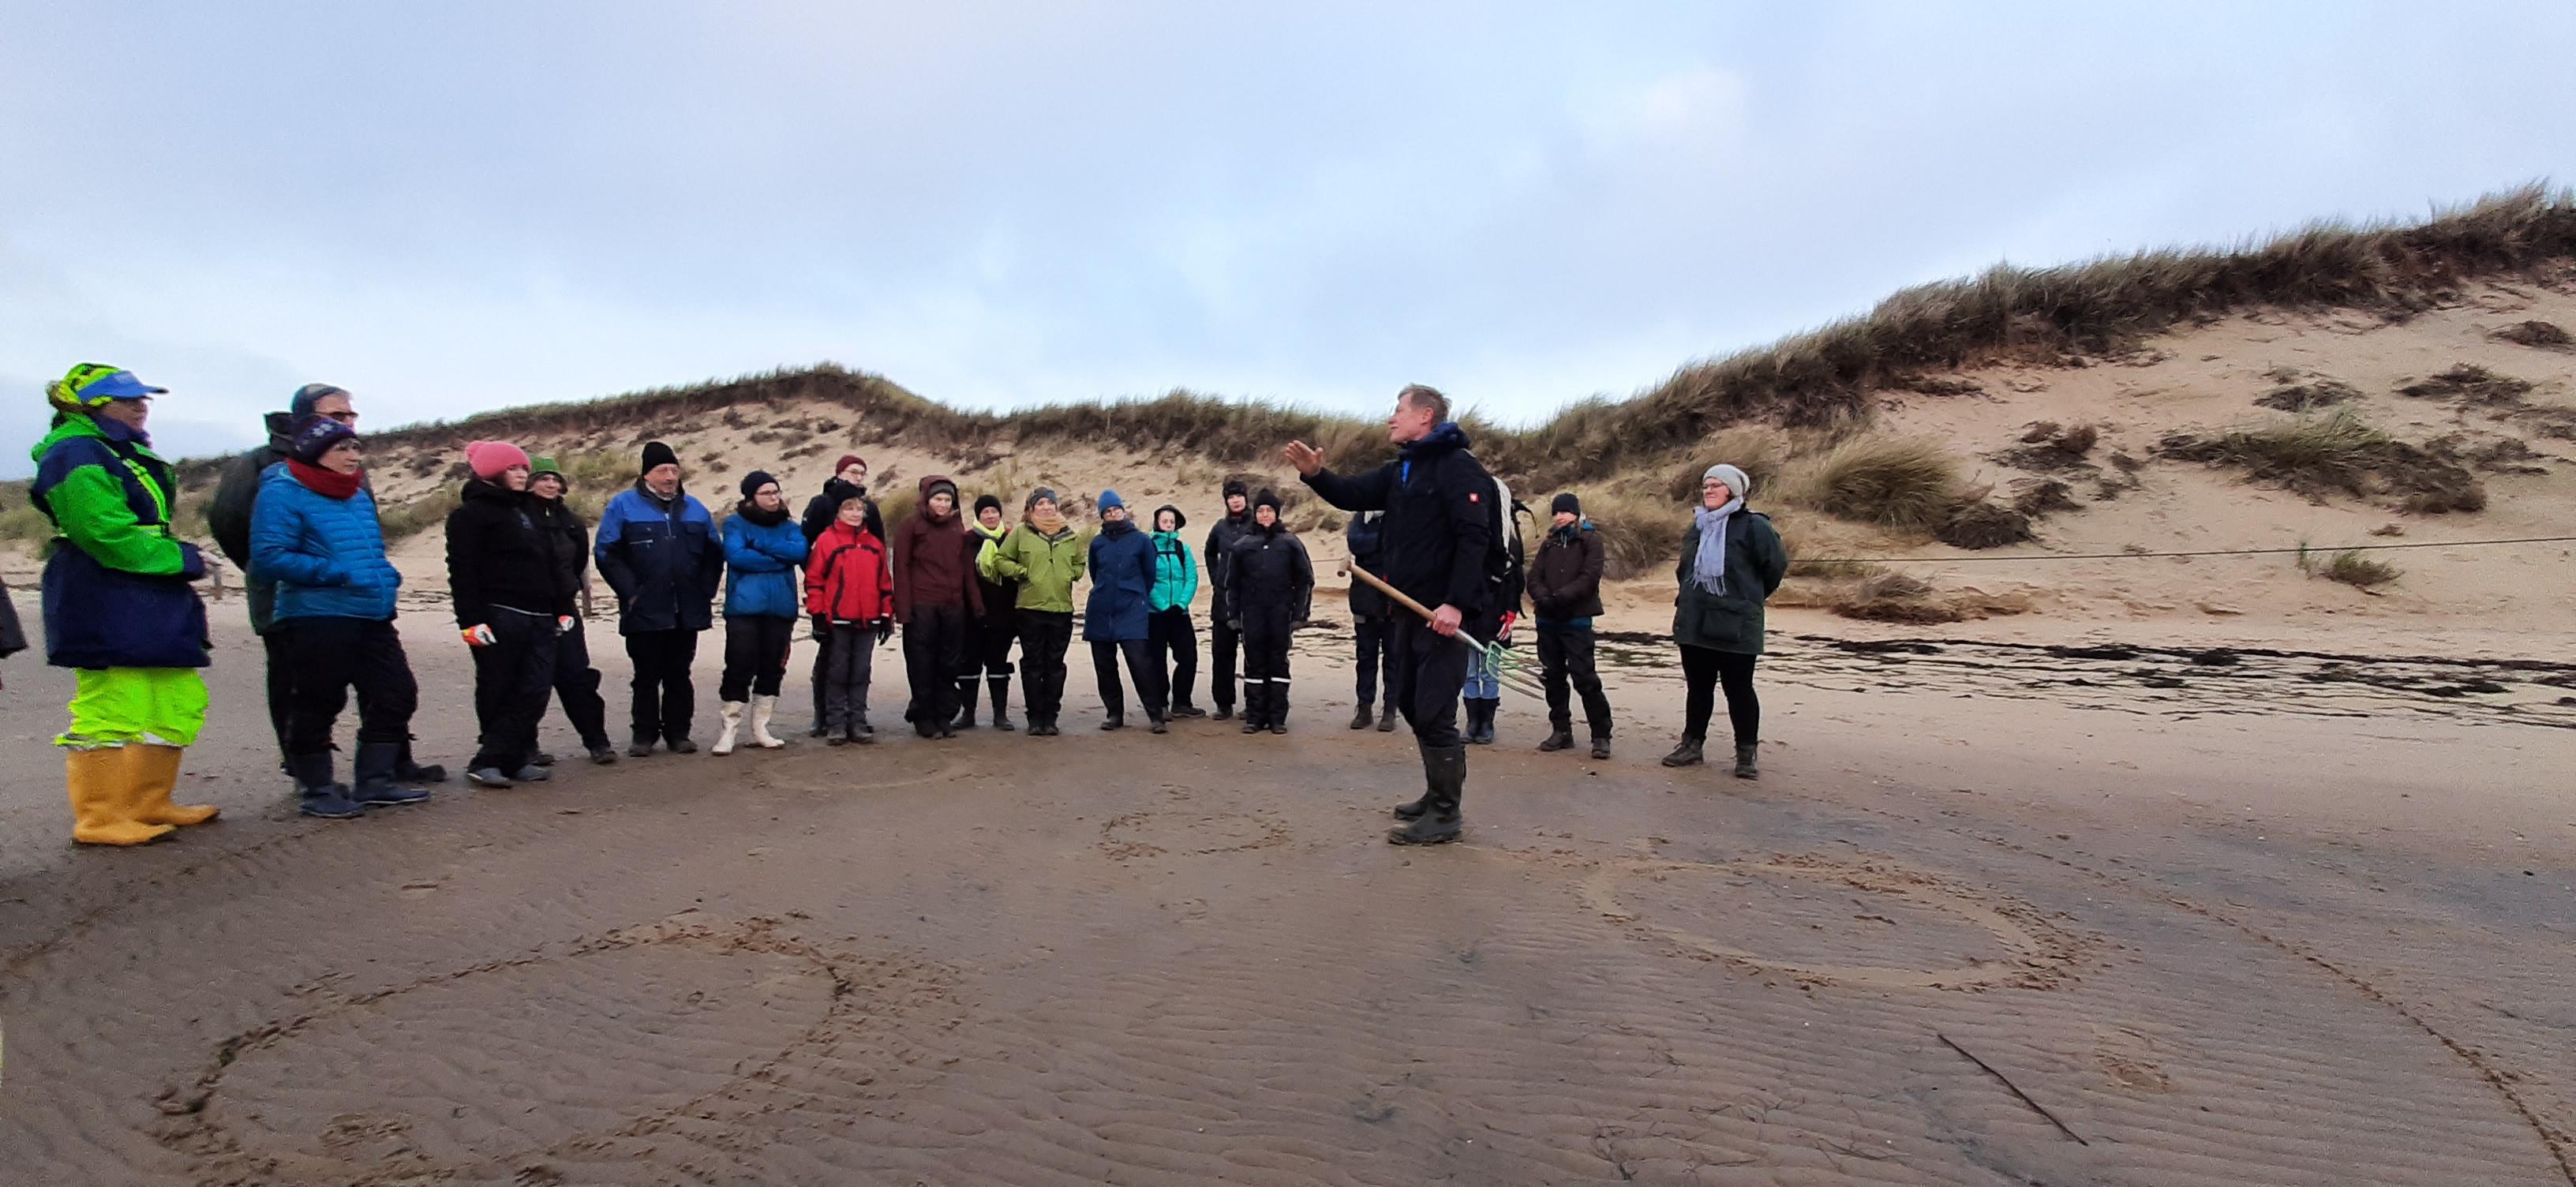 Merkwürdige Sandkreise am Strand